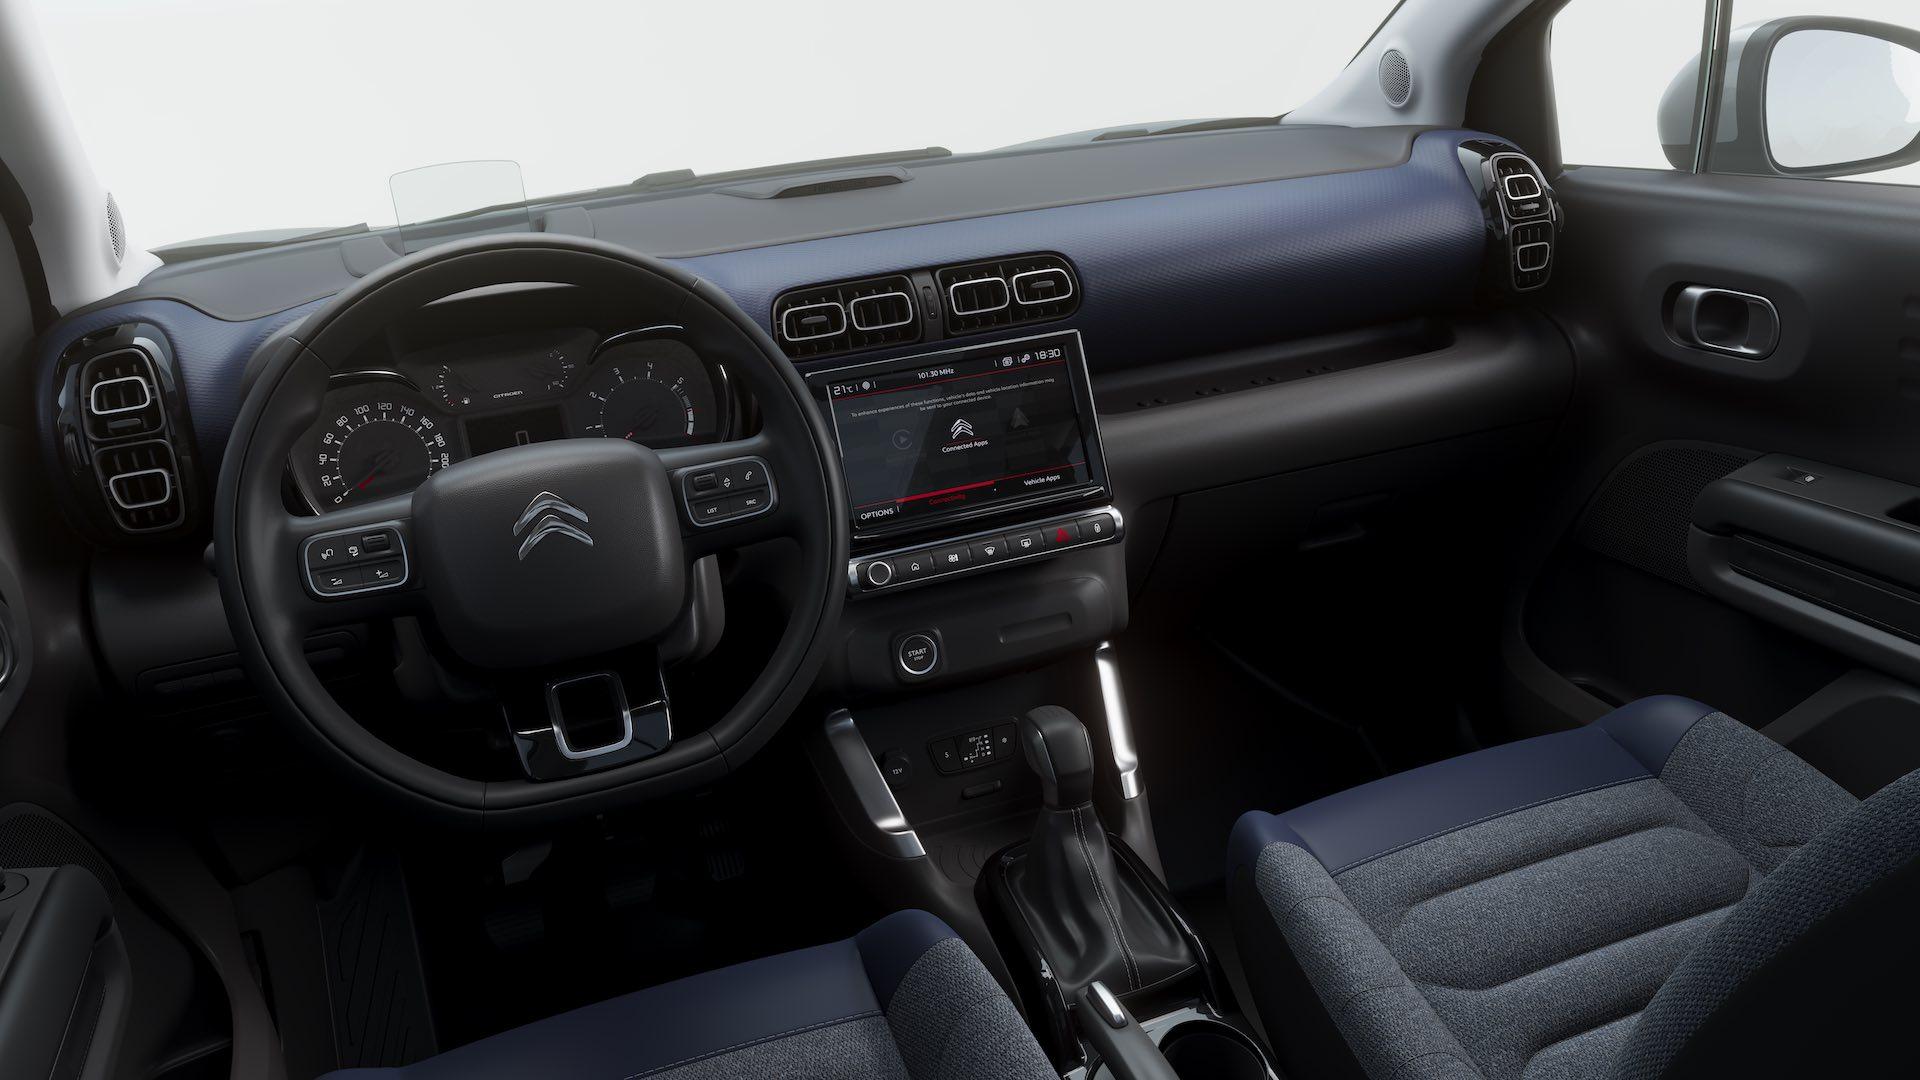 Foto Interni Citroen C3 Aircross 2021